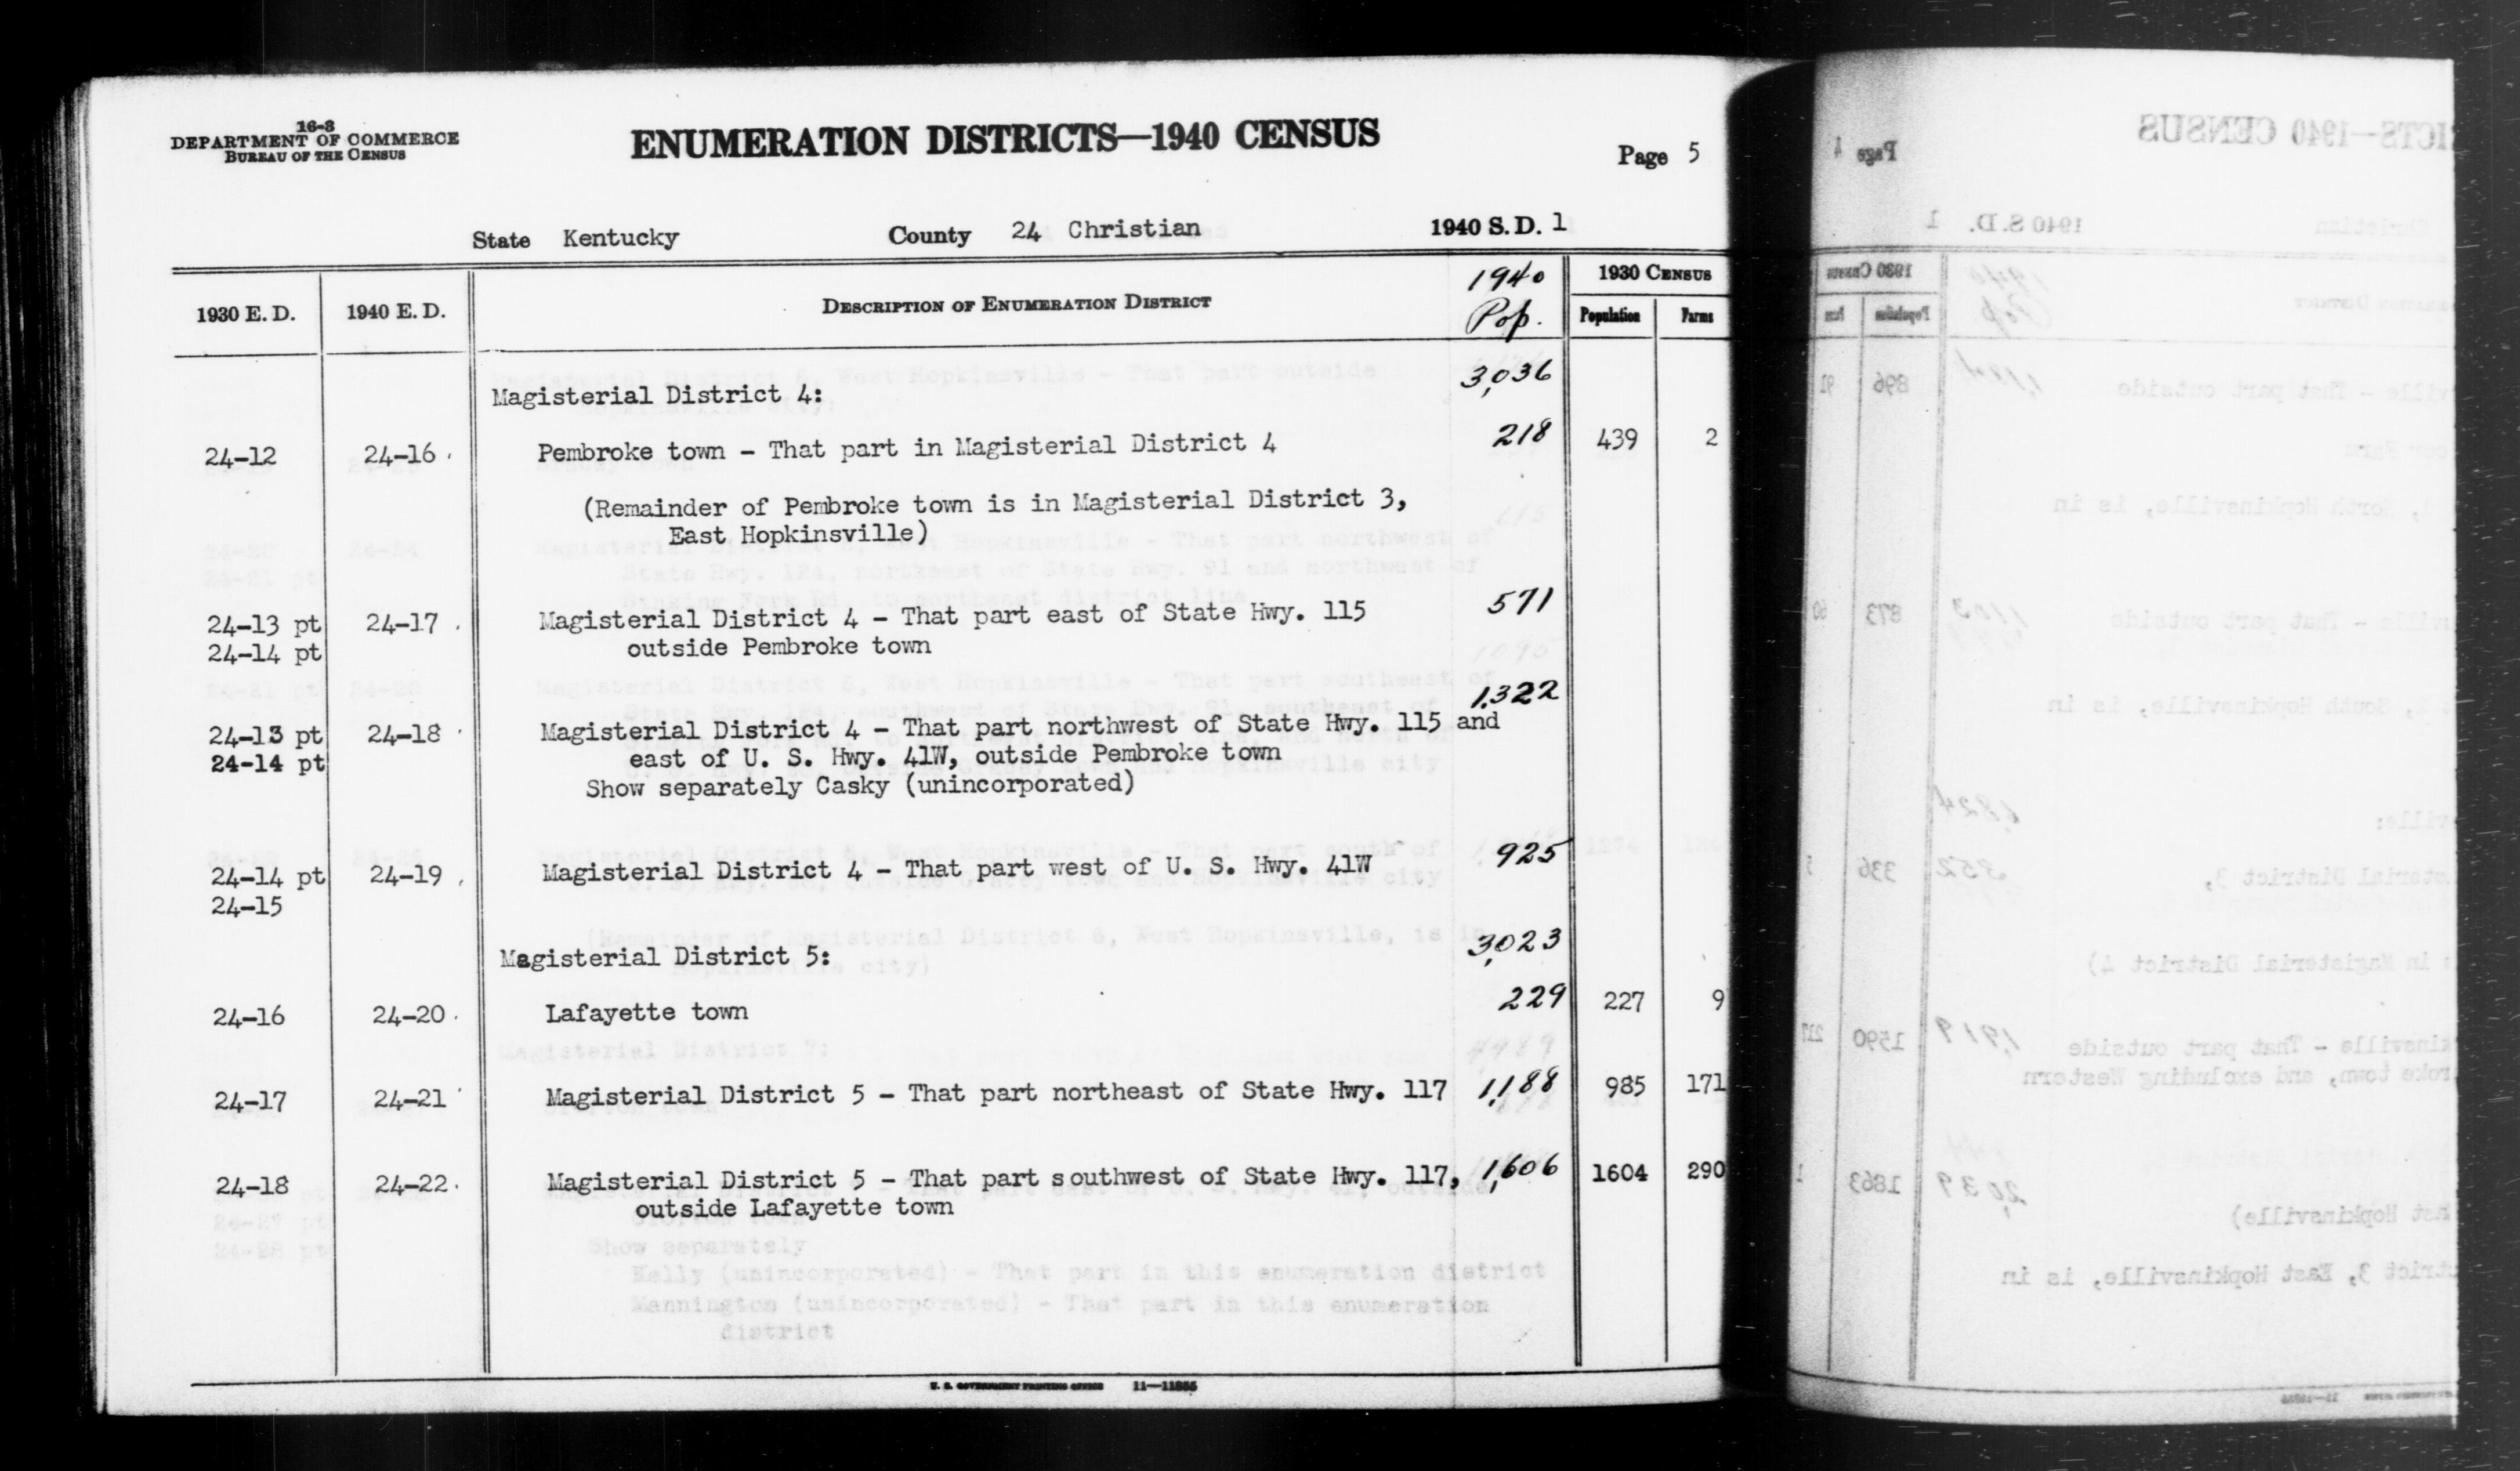 1940 Census Enumeration District Descriptions - Kentucky - Christian County - ED 24-16, ED 24-17, ED 24-18, ED 24-19, ED 24-20, ED 24-21, ED 24-22